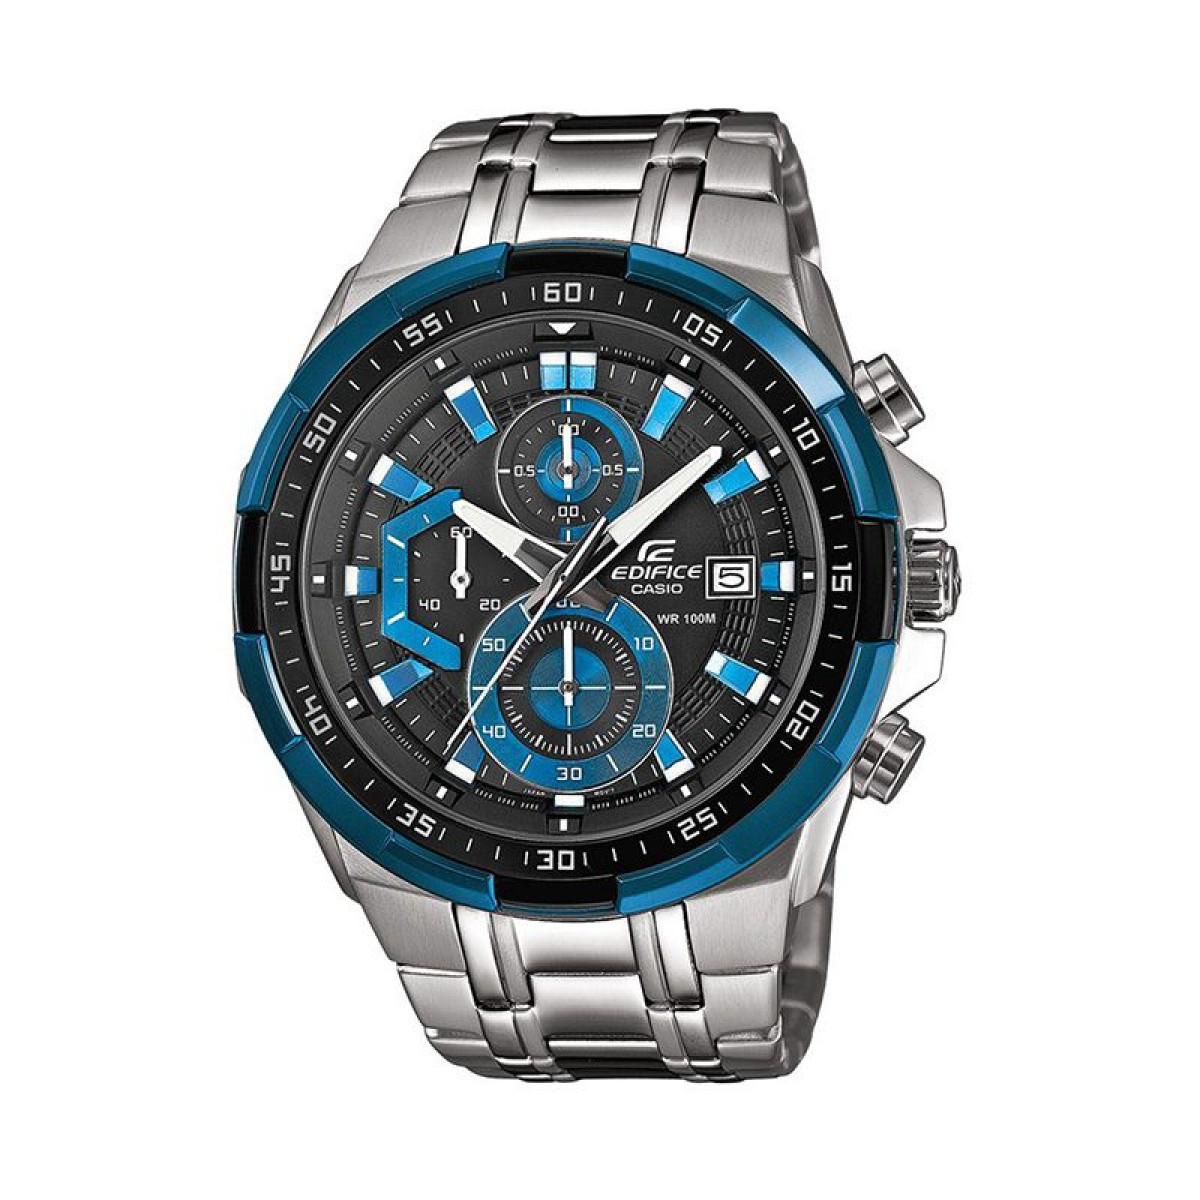 Часовник Casio EFR-539D-1A2VUEF